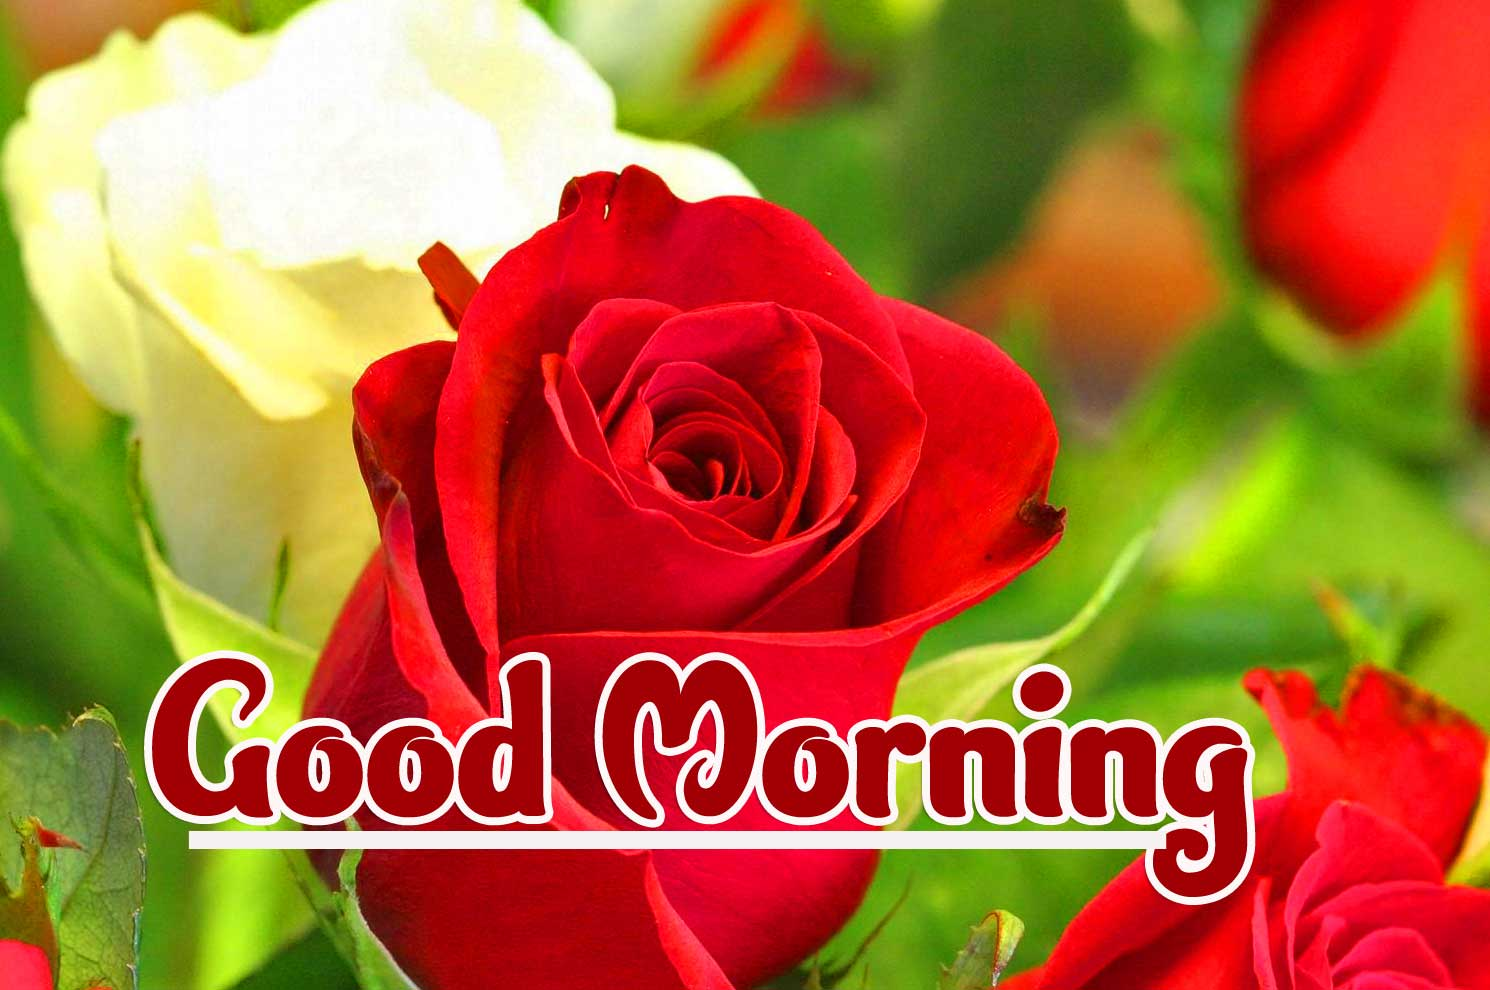 Good Morning Wallpaper Pics Full HD 1080 P